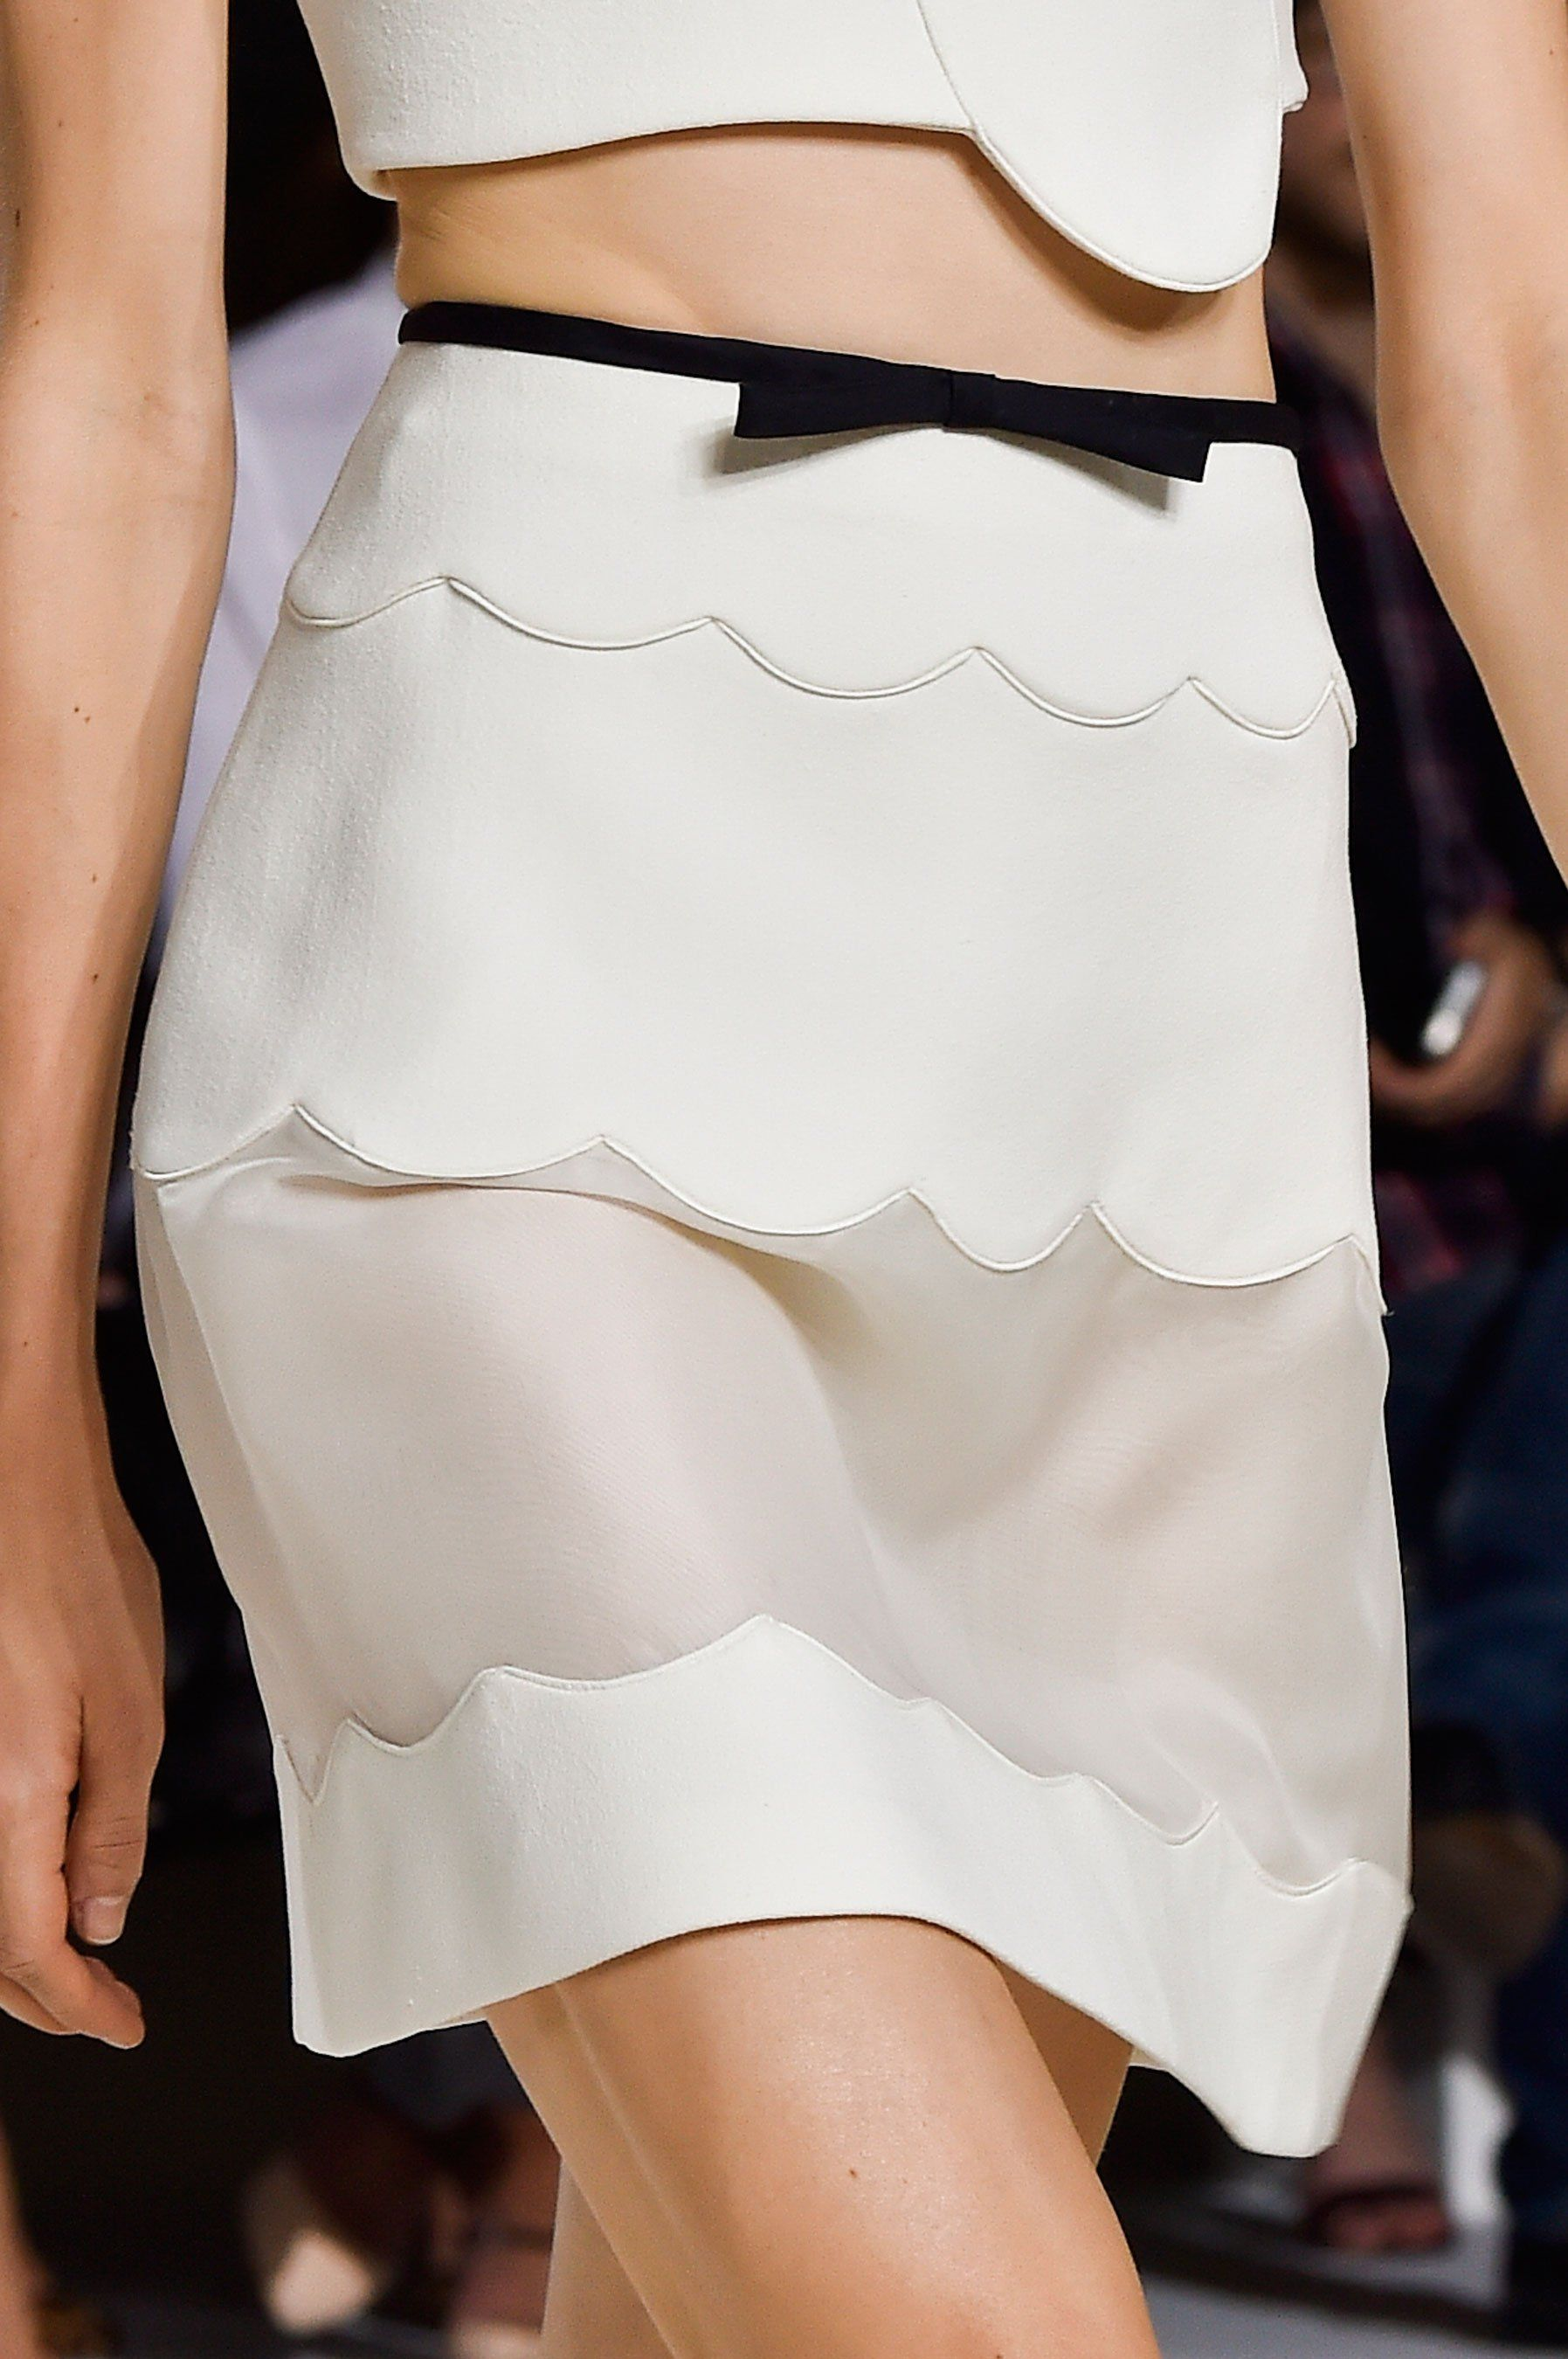 Scallop skirt with dainty bow trim; pretty fashion details // Giambattista Valli Spring 2015